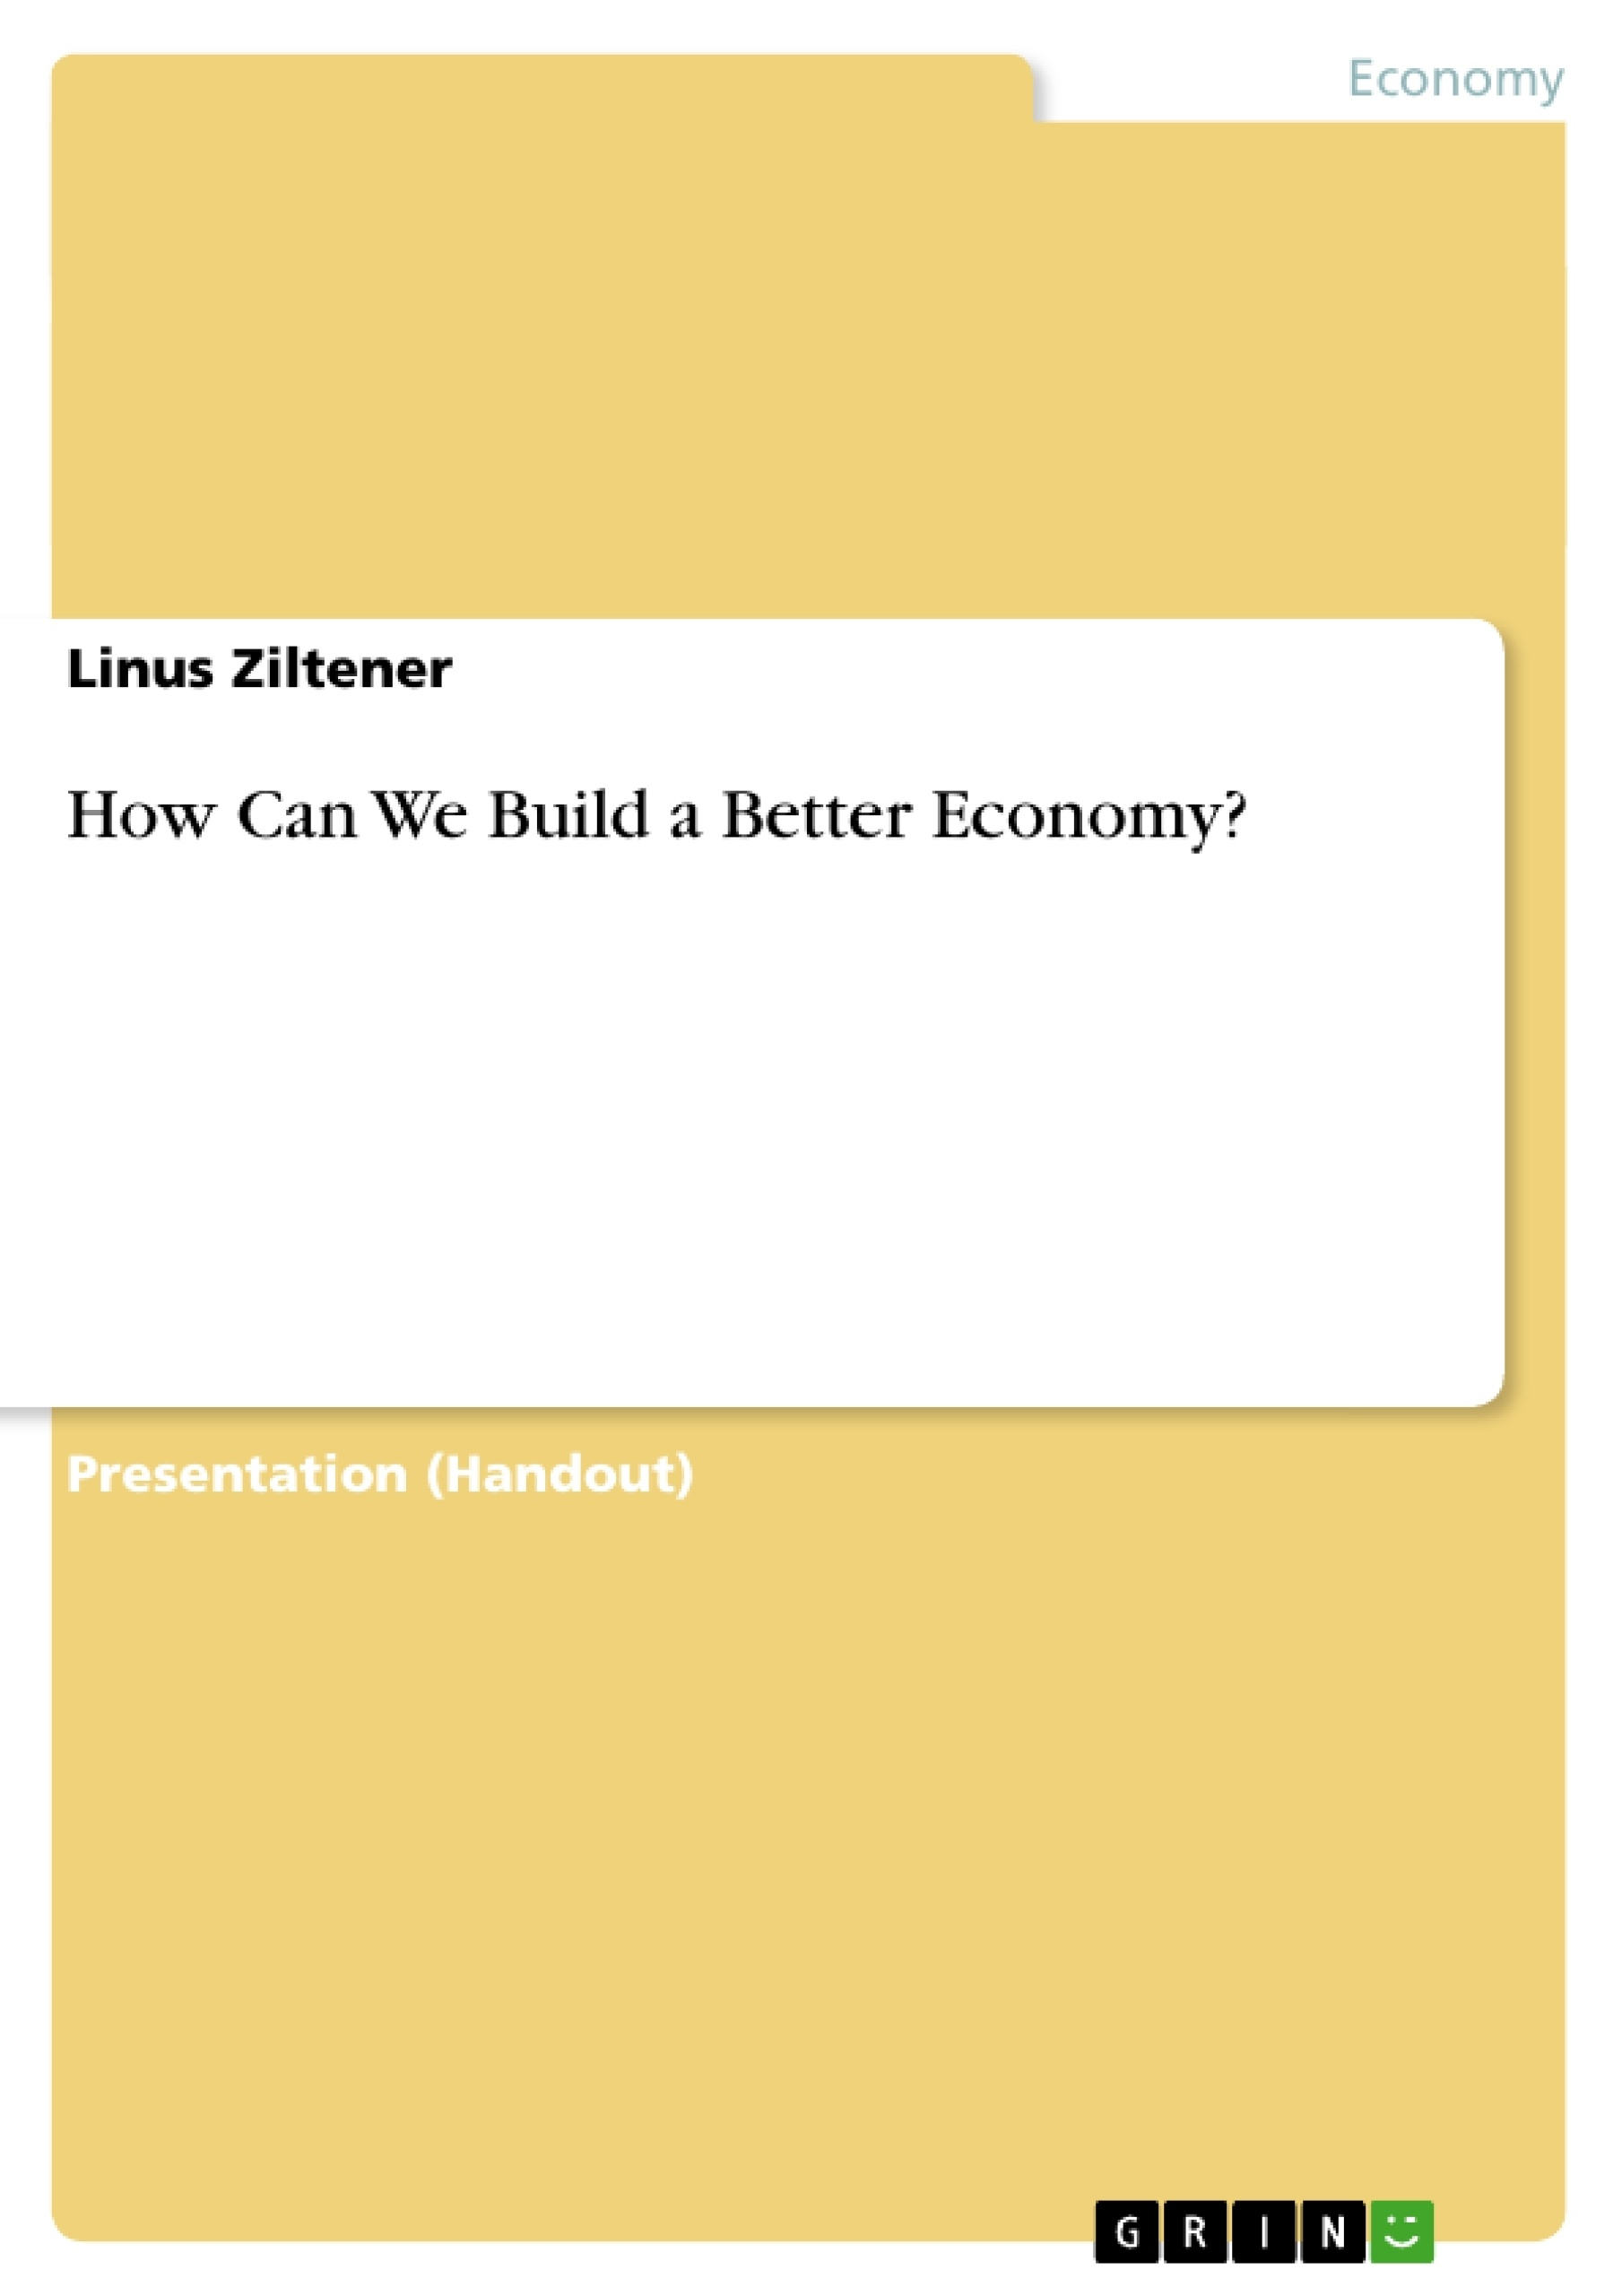 Essay economics build countries